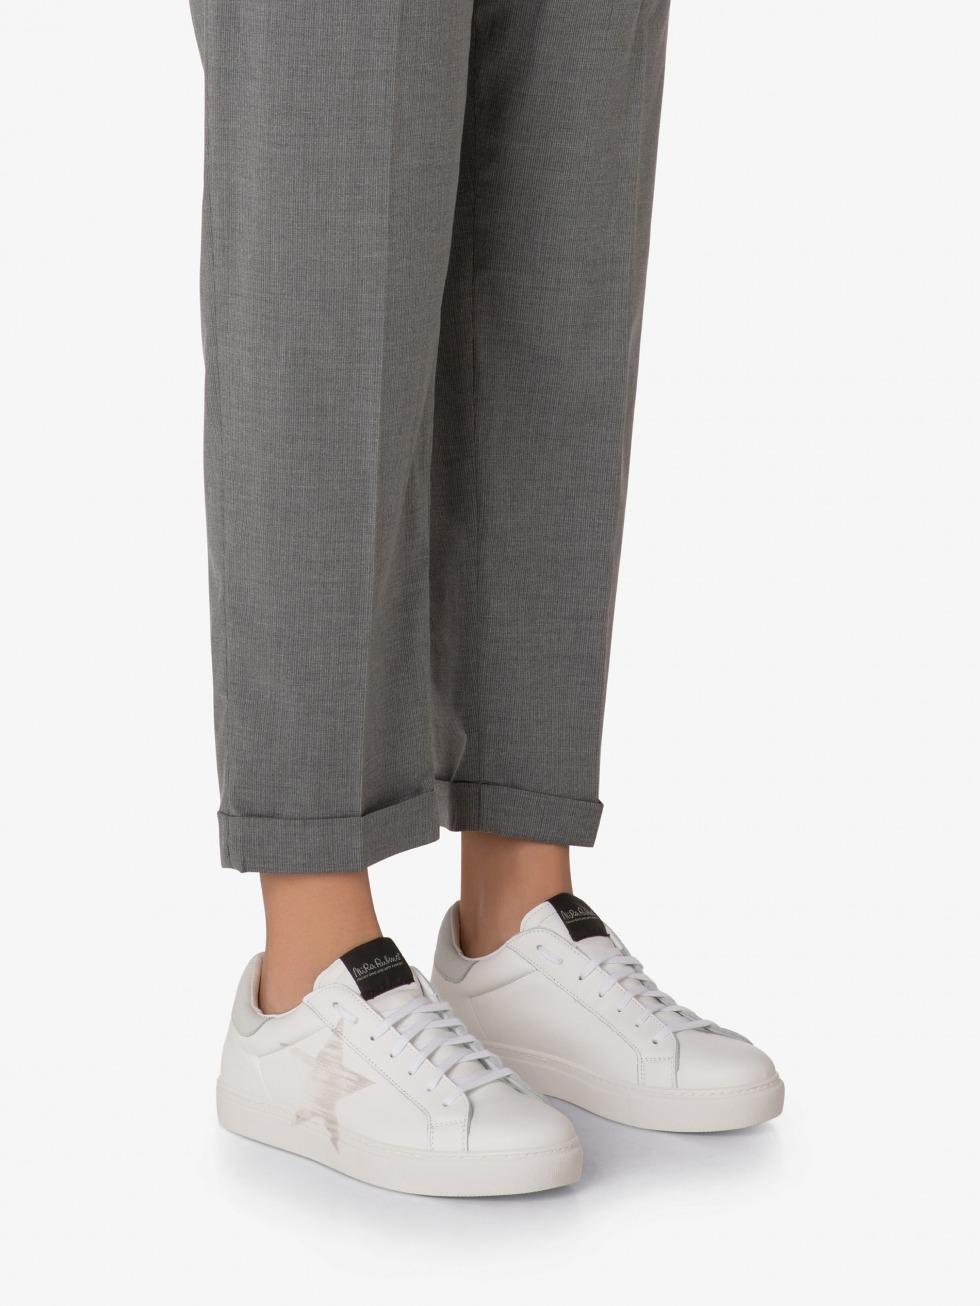 Martini M Sneakers - Off White Star